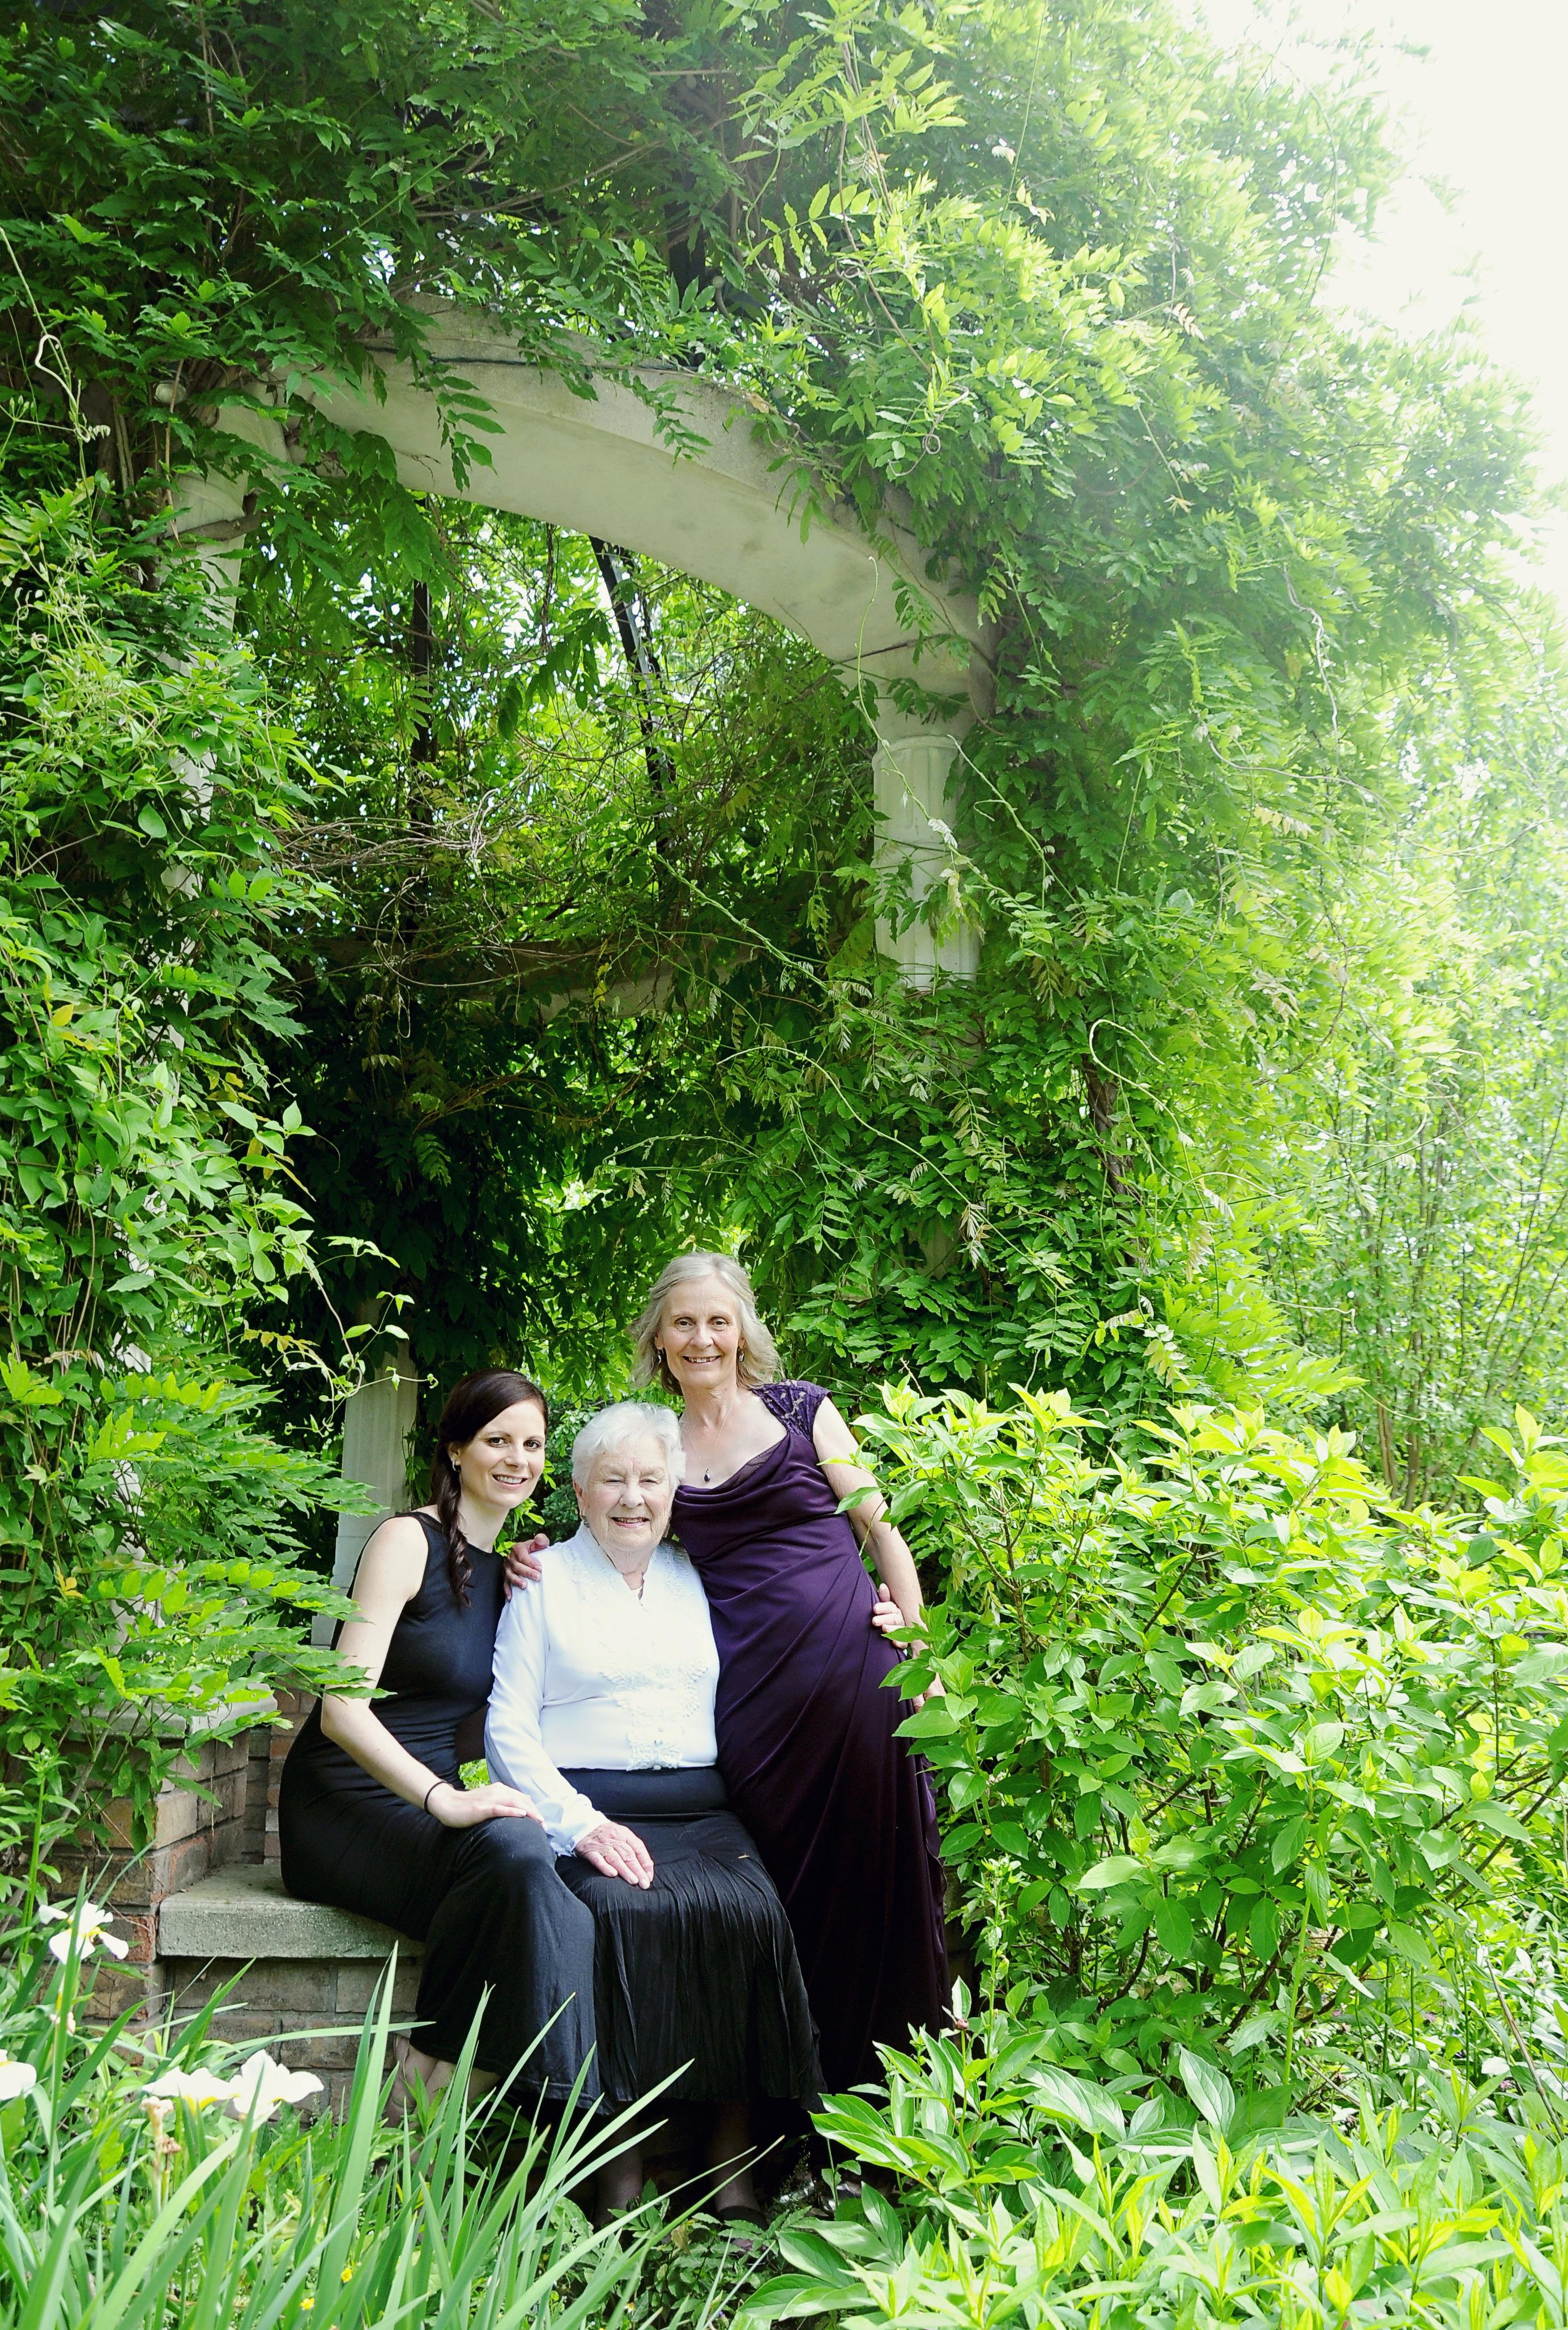 Sarah her Mom and Grandma shot 2